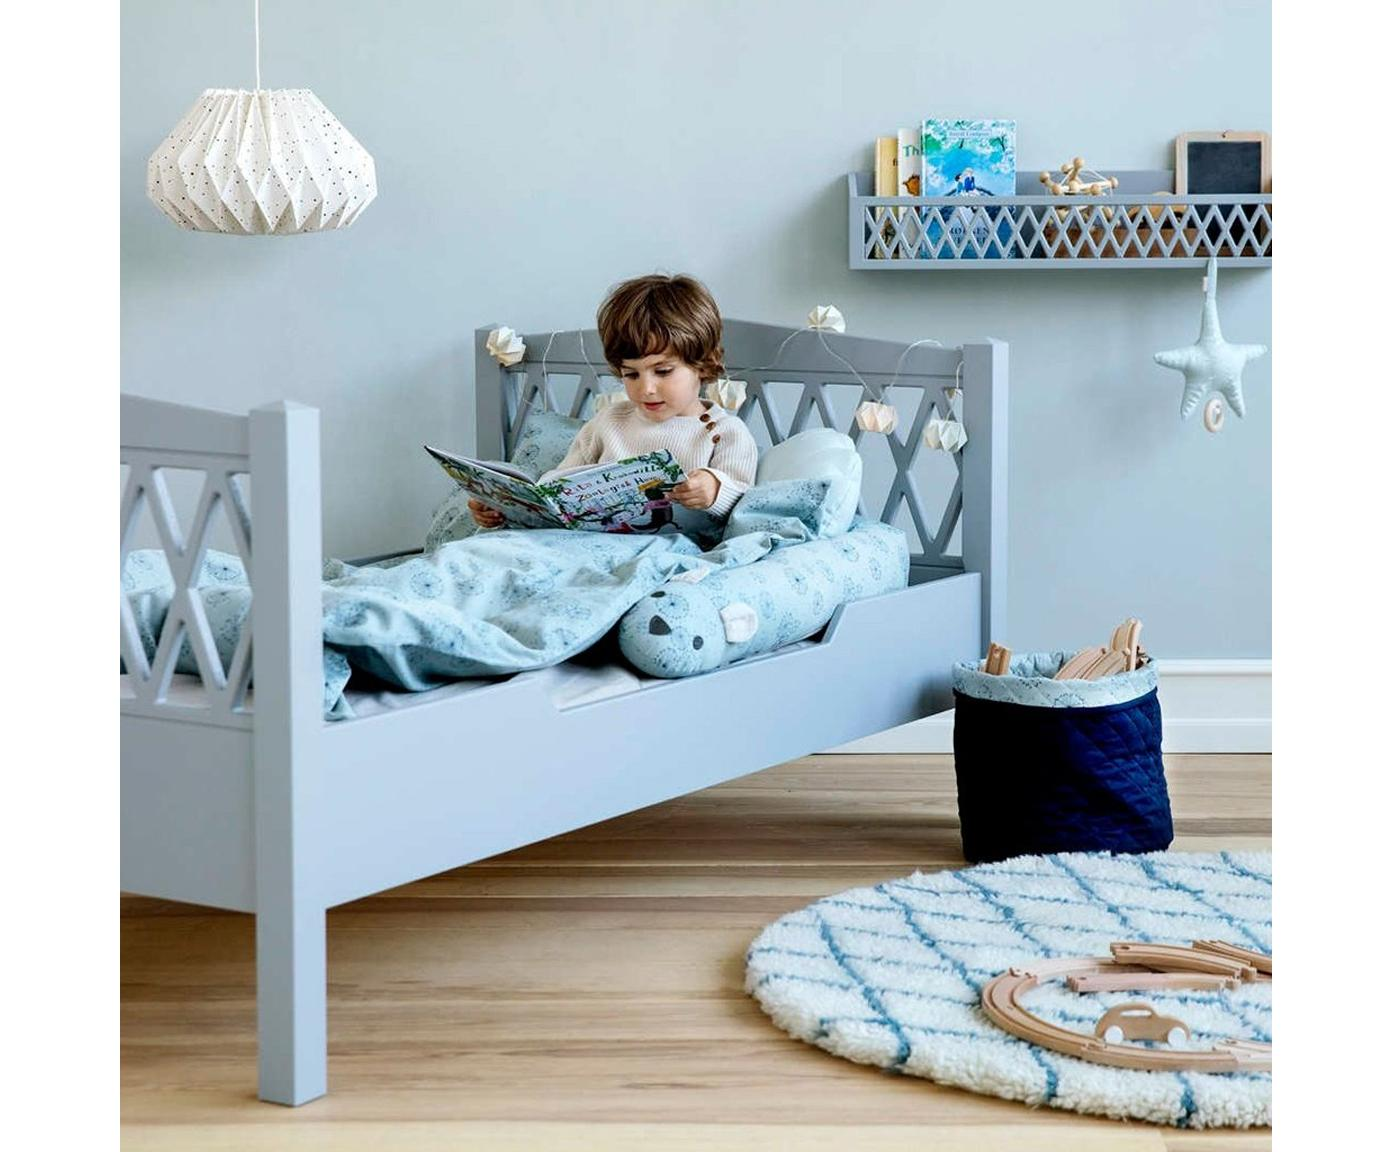 Kinderbett Harlequin, Holz, lackiert, Grau, 100 x 170 cm